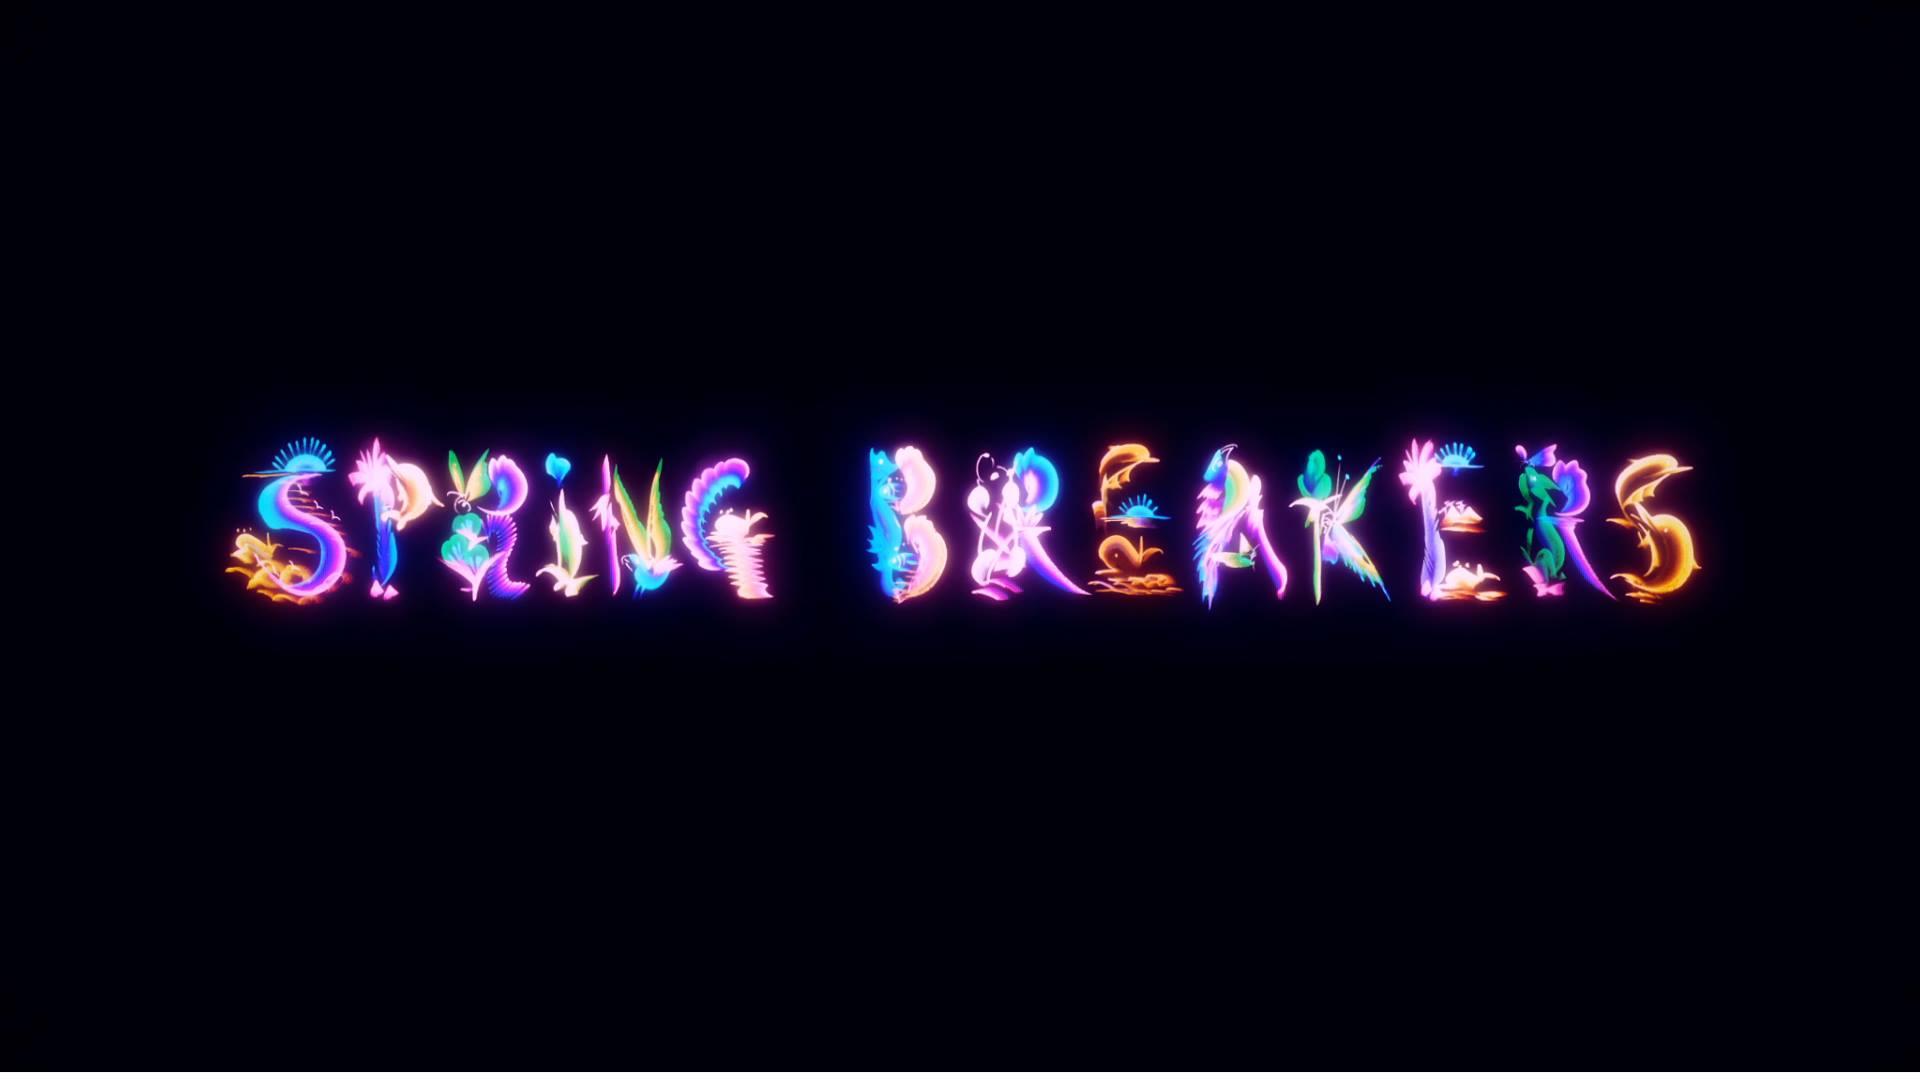 Spring breakers, 2013, Harmony Korine